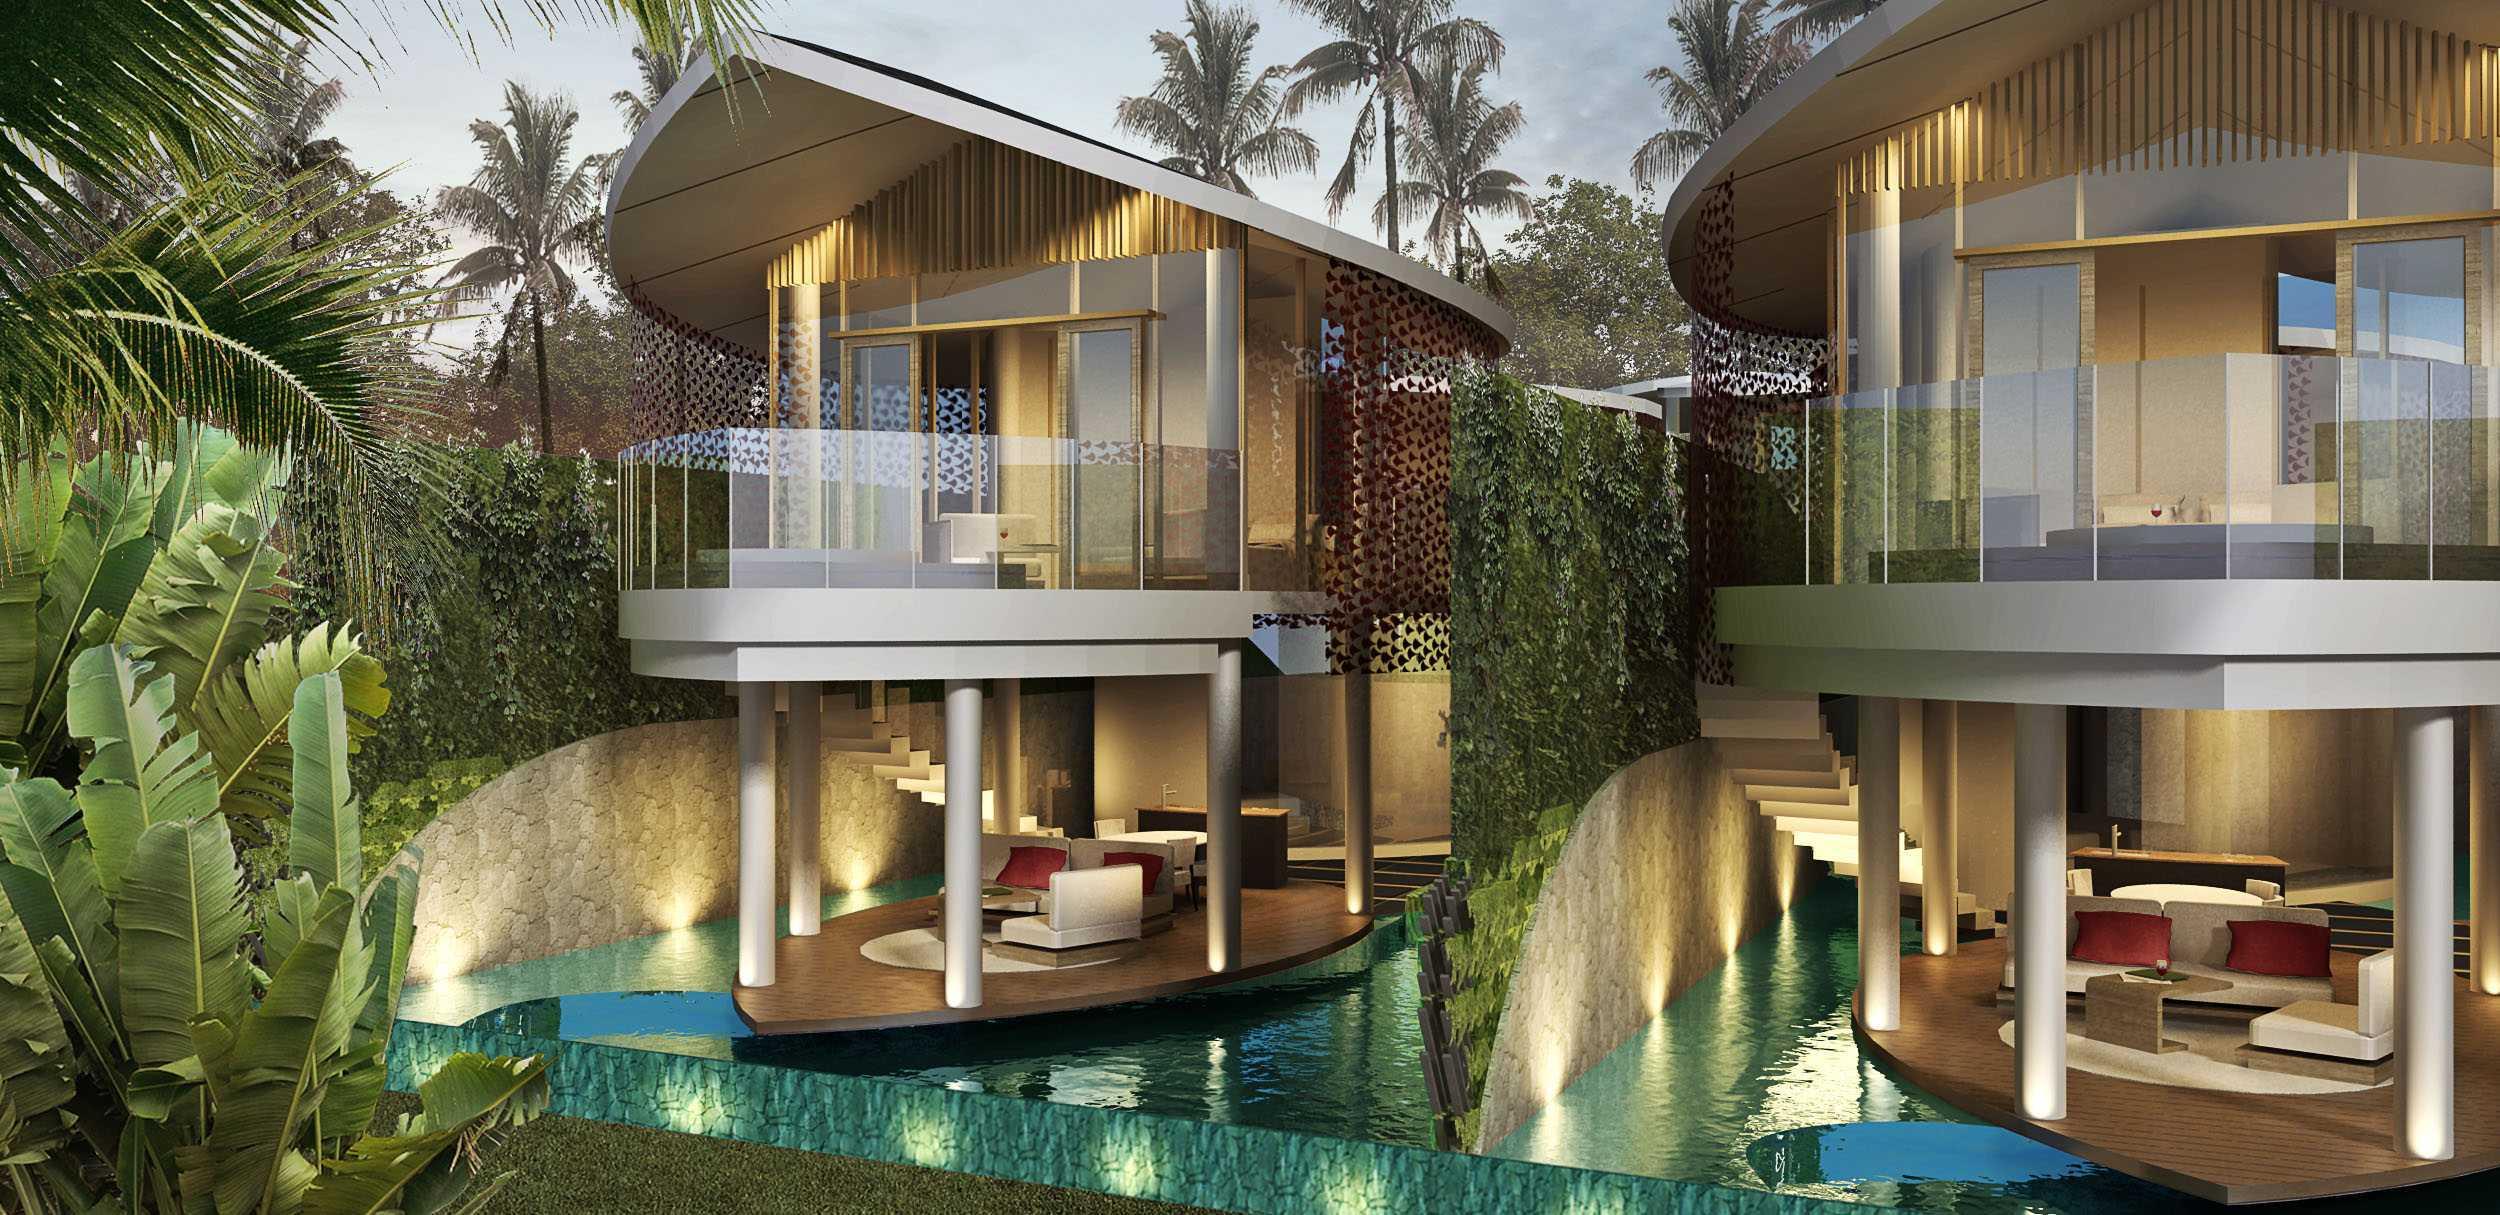 Mikael Wahyu Villa Pecatu Bali Bali 2-Bedroom-Type-1   26062